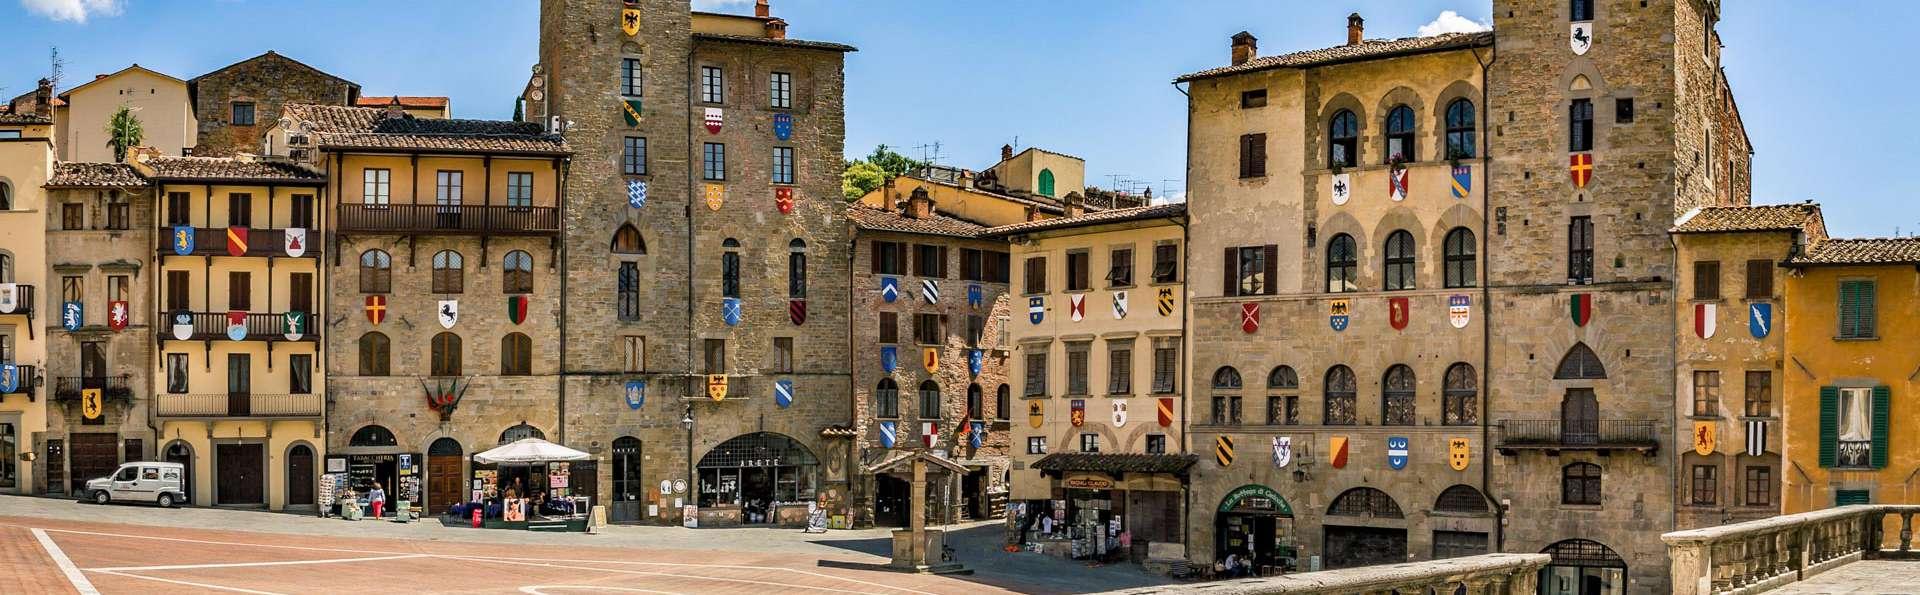 Borgo Dolci Colline Spa & Relax - EDIT_AREZZO_03.jpg